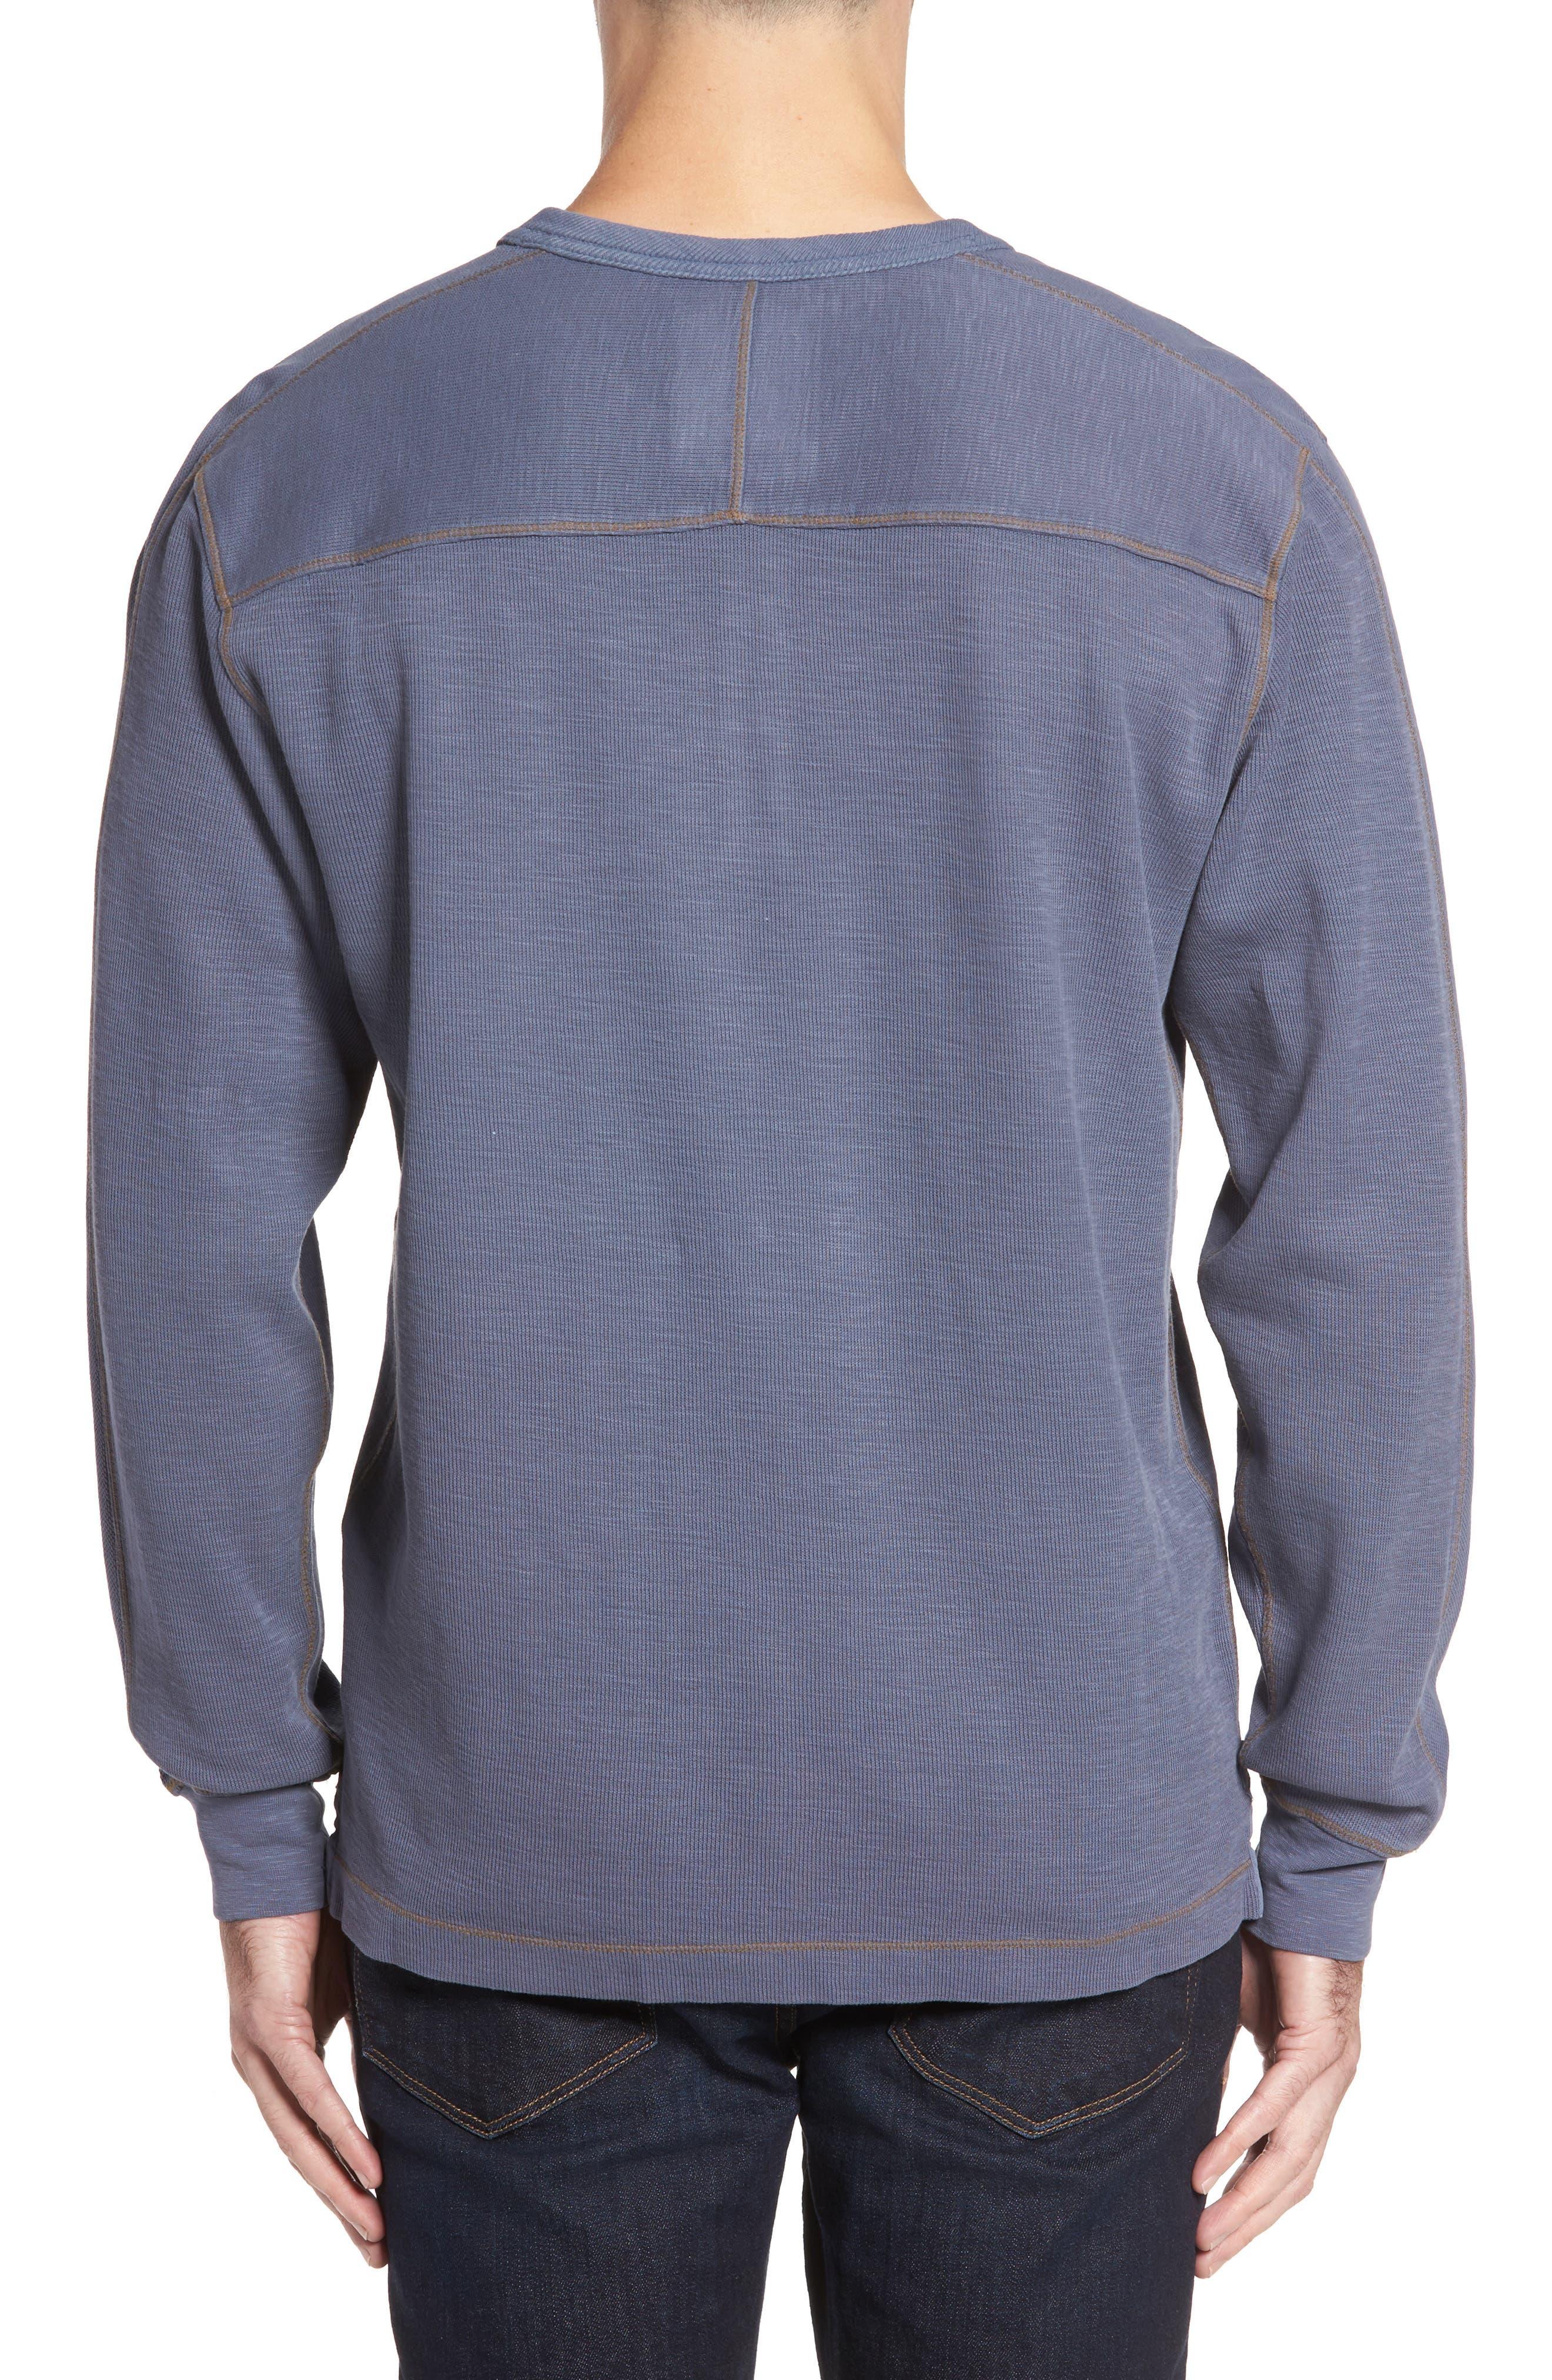 Hans Long Sleeve Henley T-Shirt,                             Alternate thumbnail 2, color,                             014